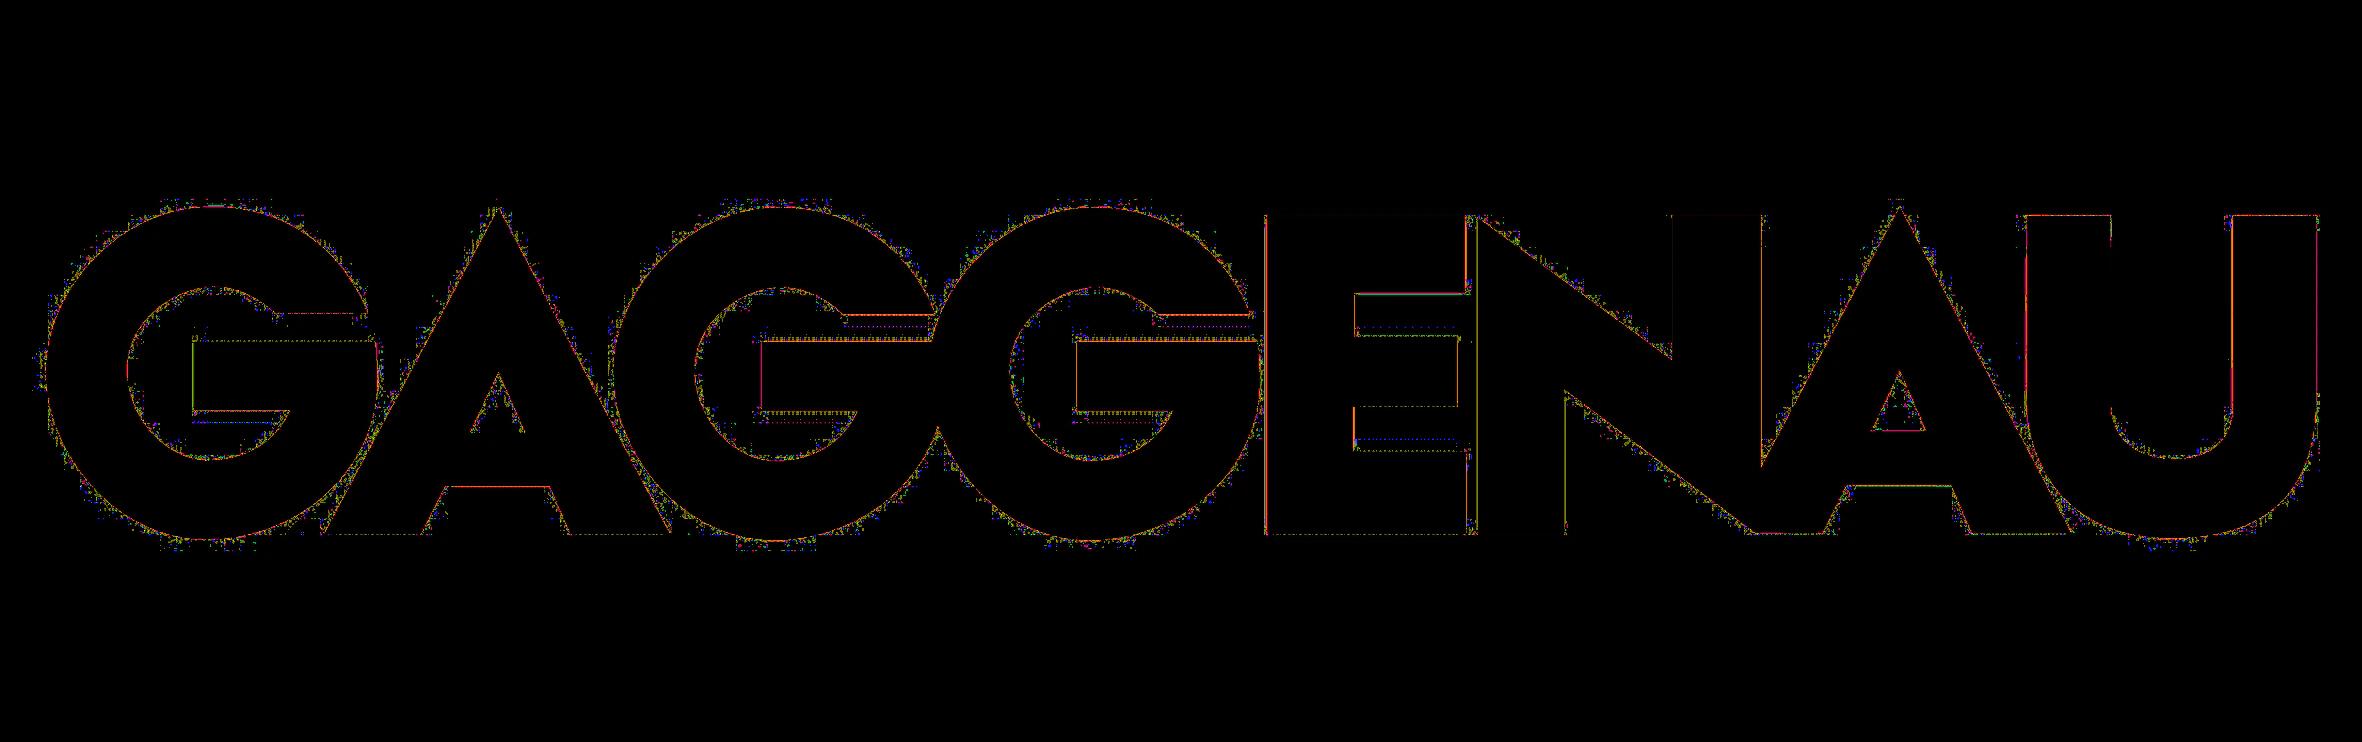 Gaggenau brand logo